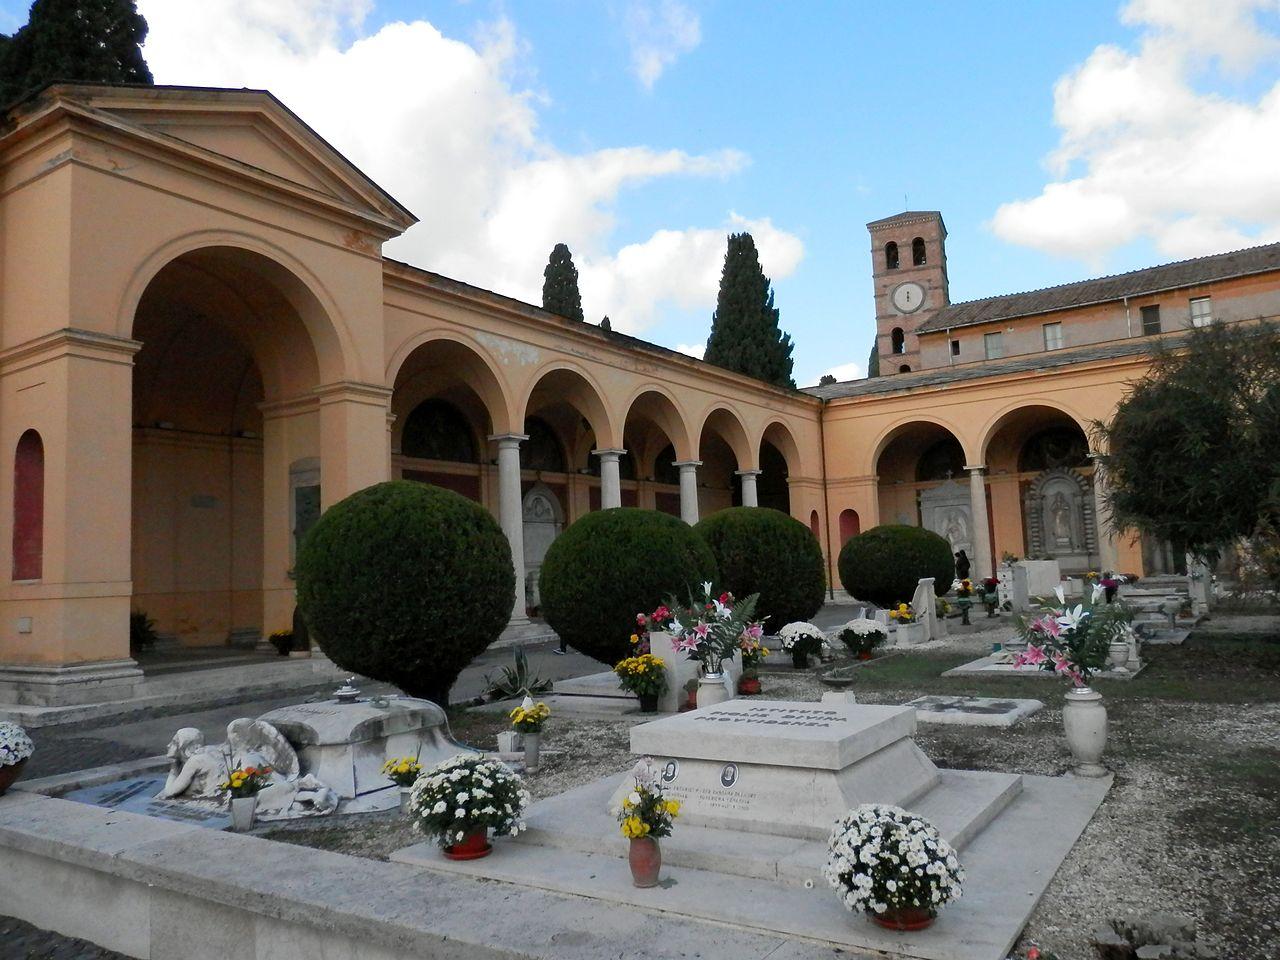 The Monumental Cemetery of Campo Verano